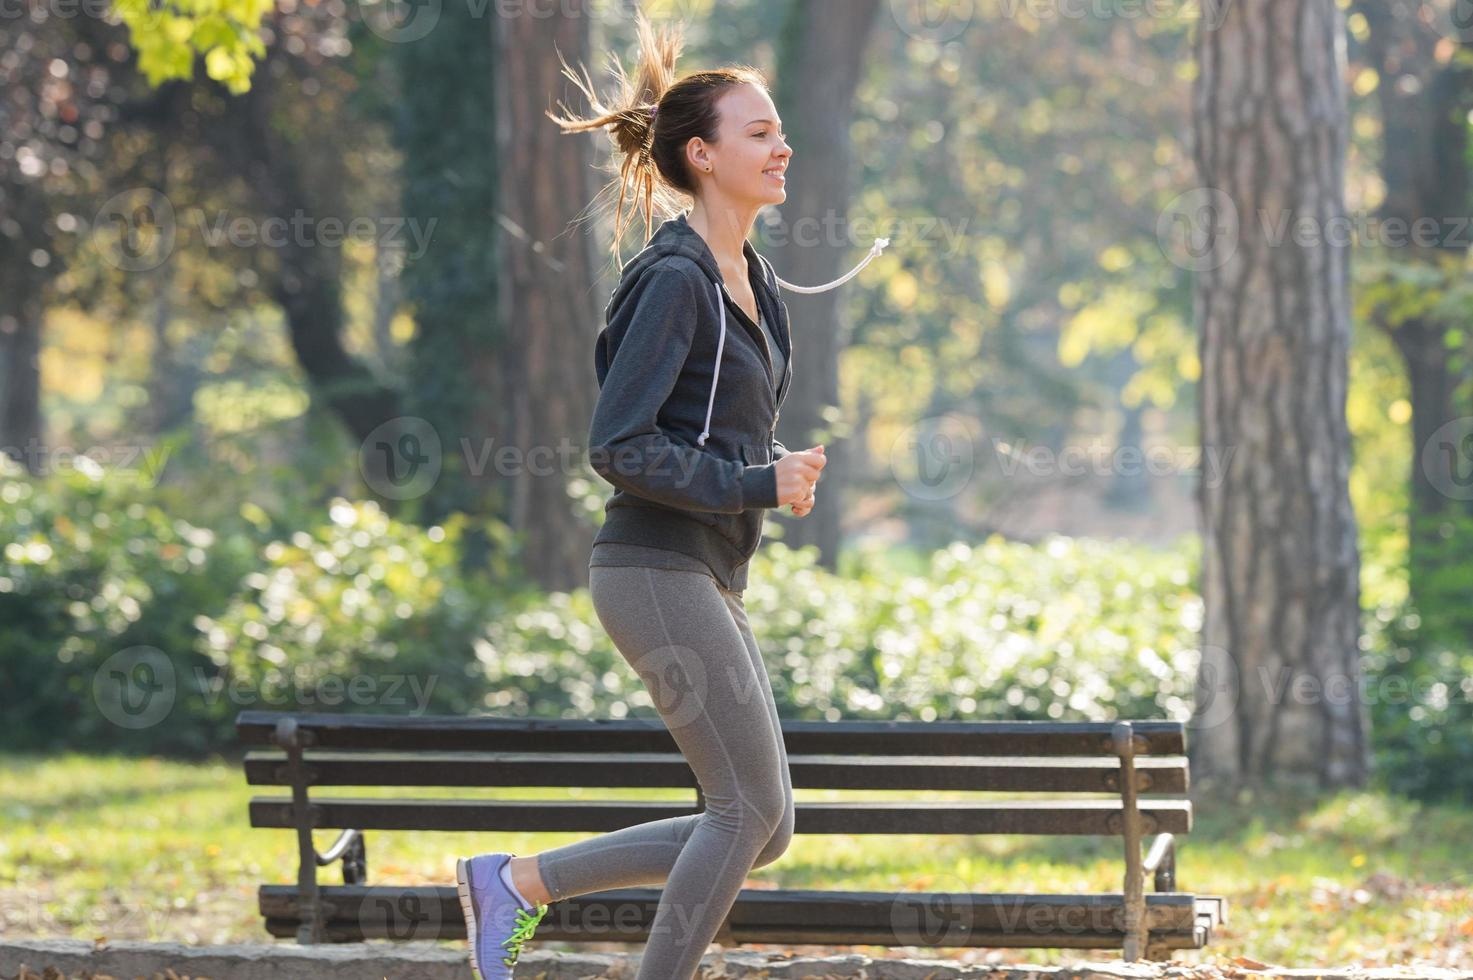 jolie jeune fille jogging photo